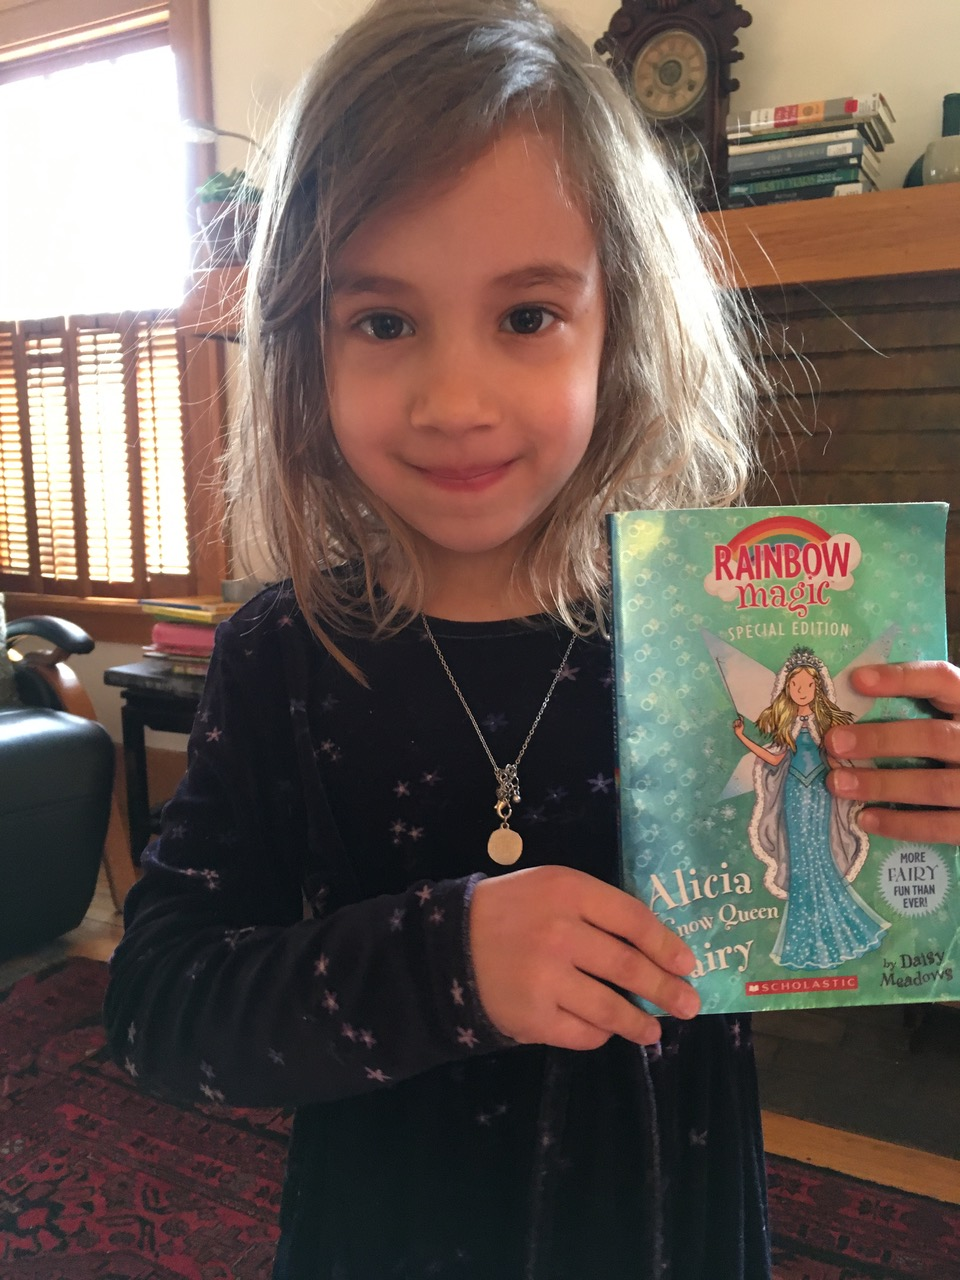 Rosenwaike's child holding a Rainbow Magic book.